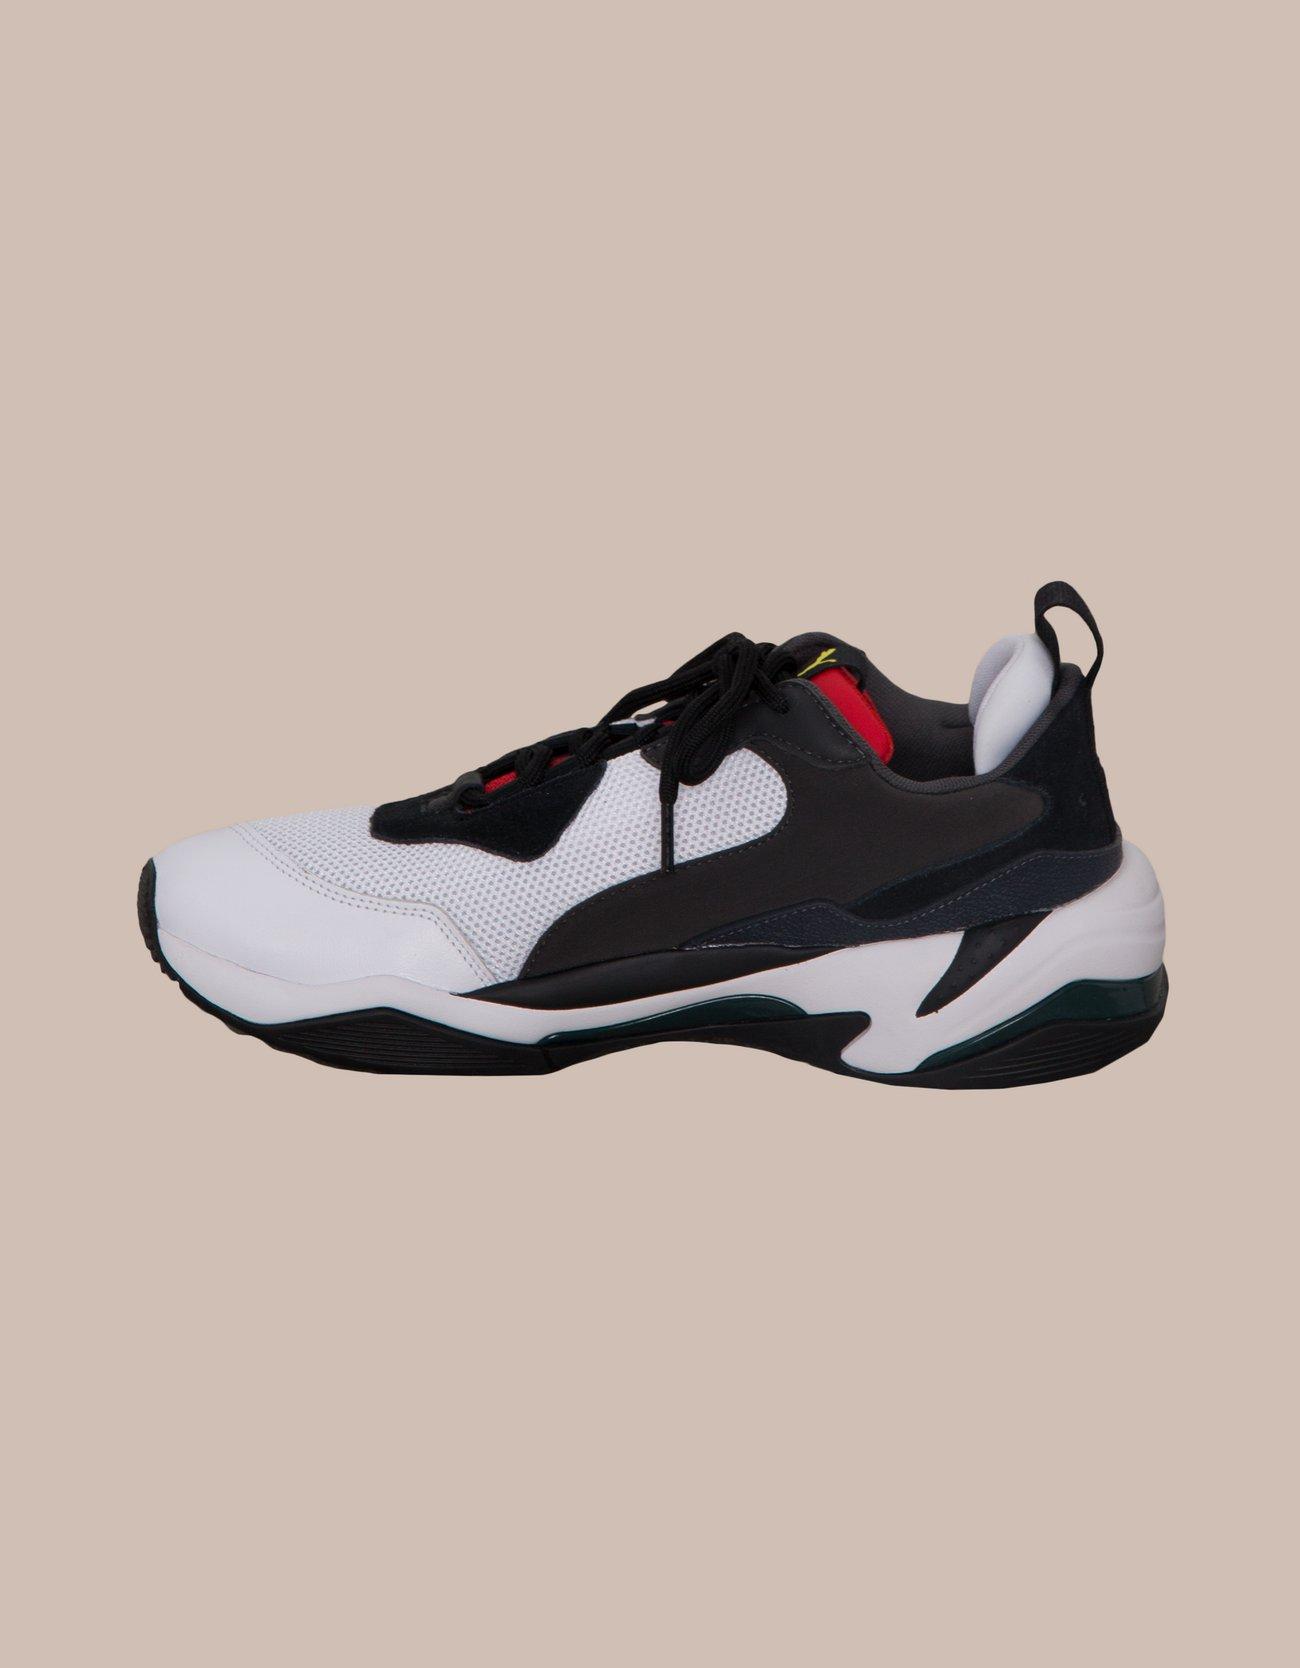 cheaper ccca6 087d4 Sneaker showdown   Nlyman.com